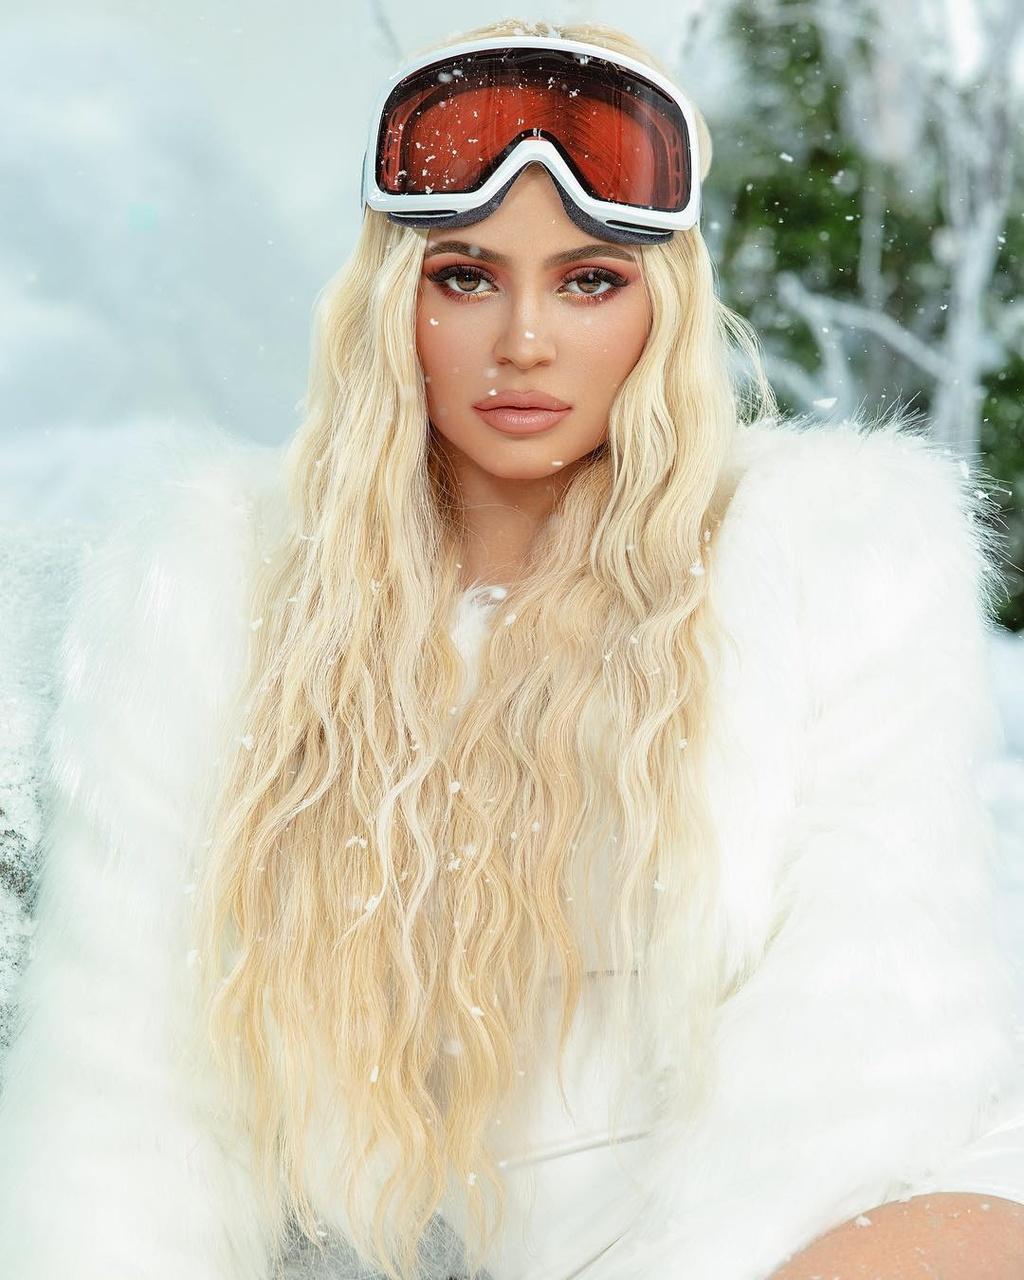 Kylie Jenner - ngoi sao quyen luc va sexy nhat mang xa hoi 2018 hinh anh 5